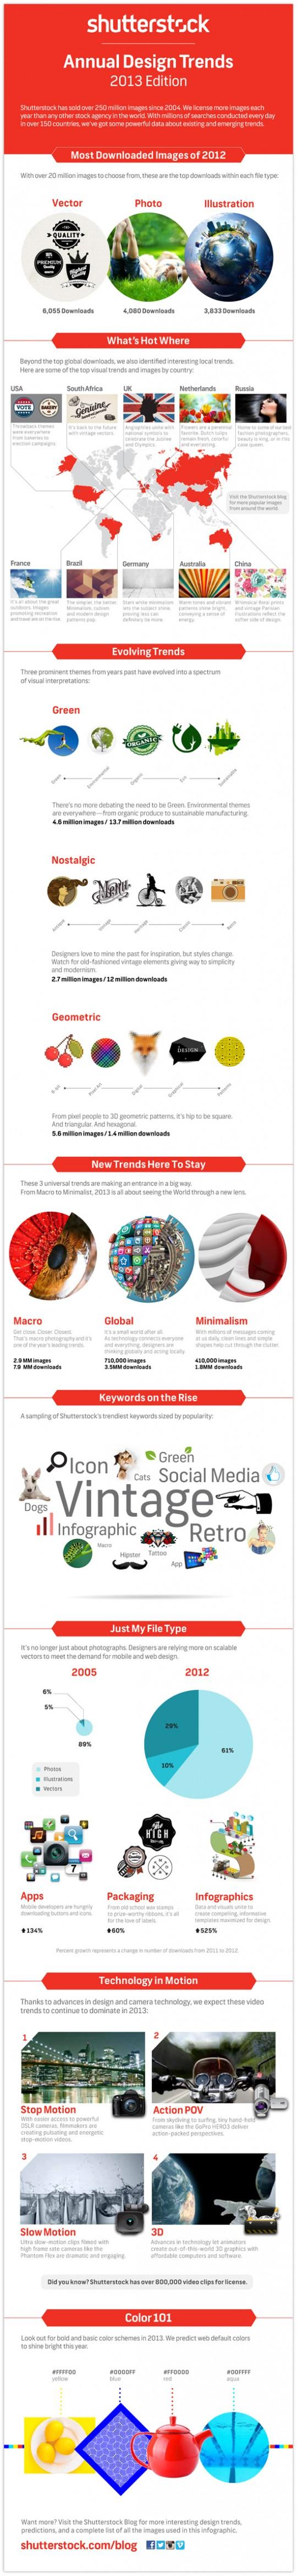 Shutterstock infographic